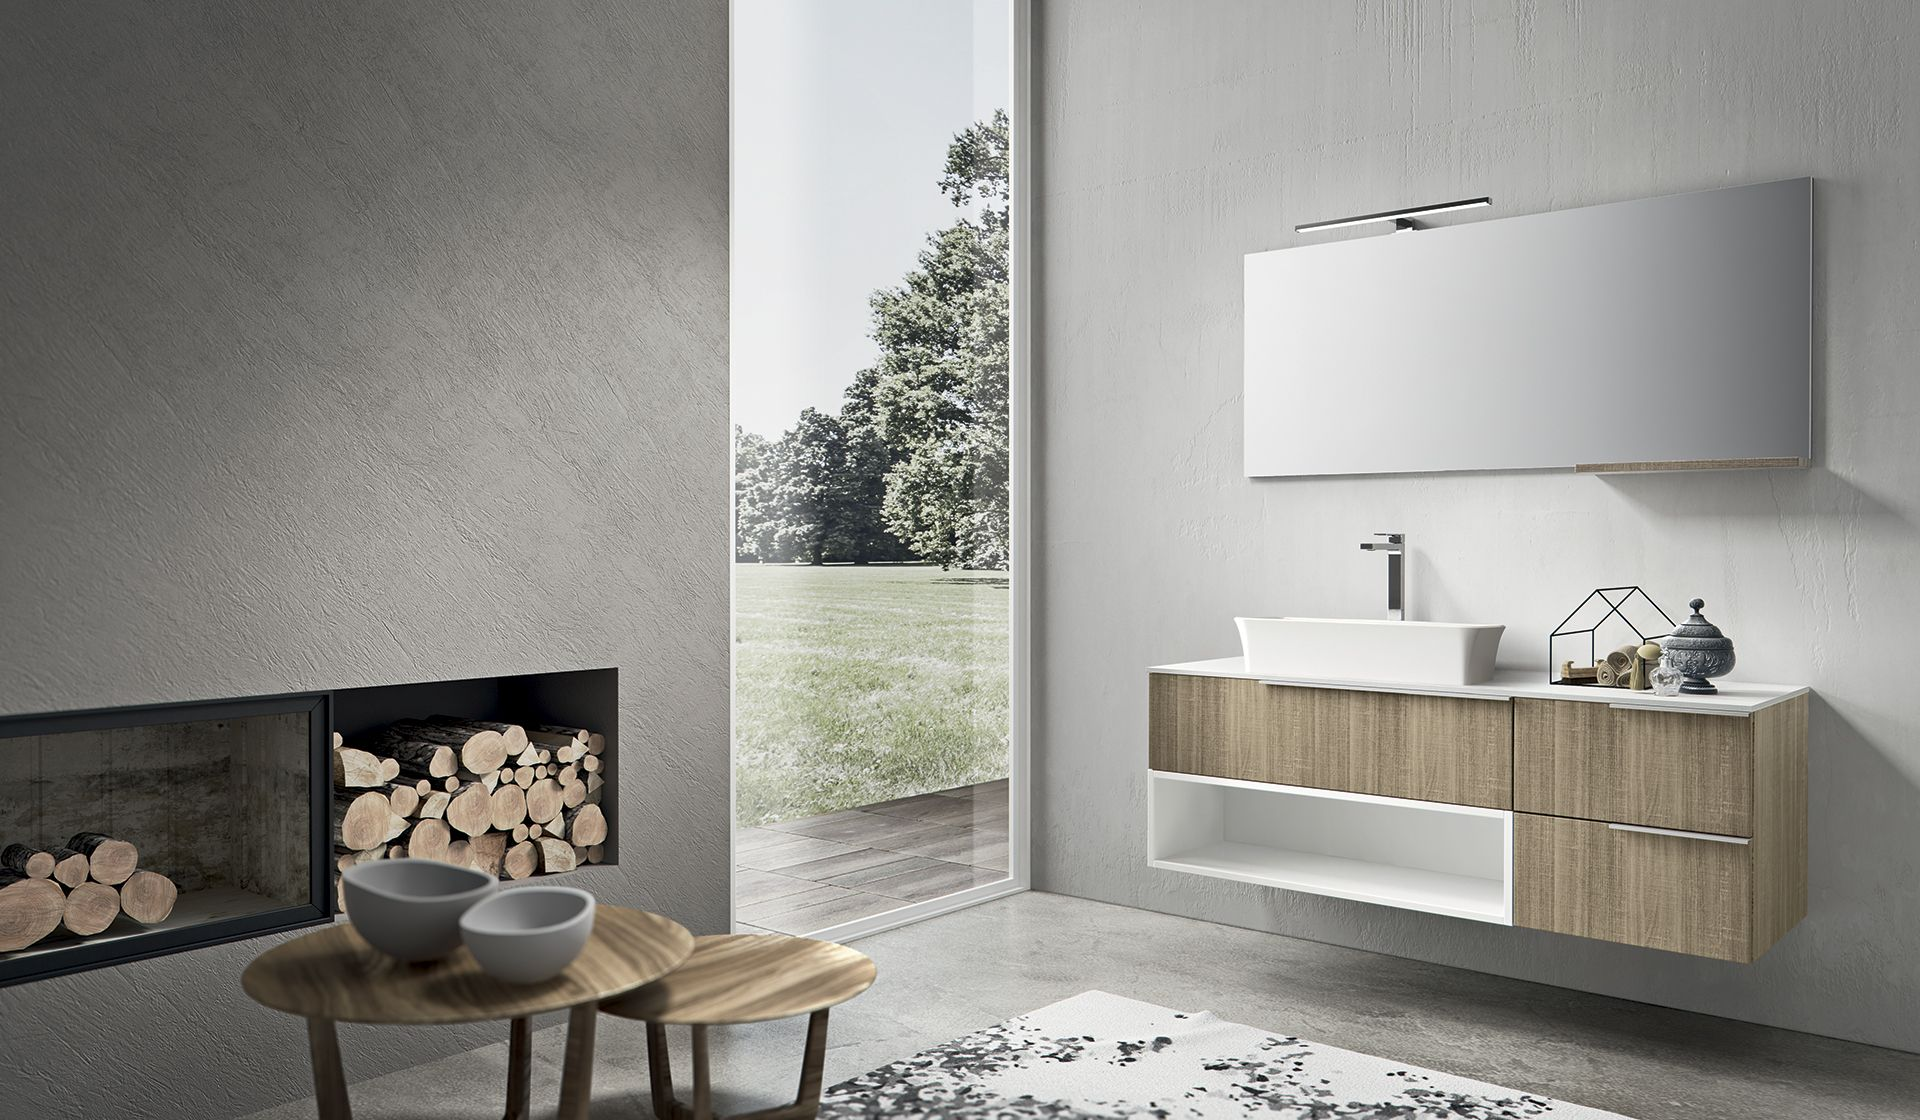 Artimode Bagno ~ Design bagno moderno kyros agoràgroup edoné design